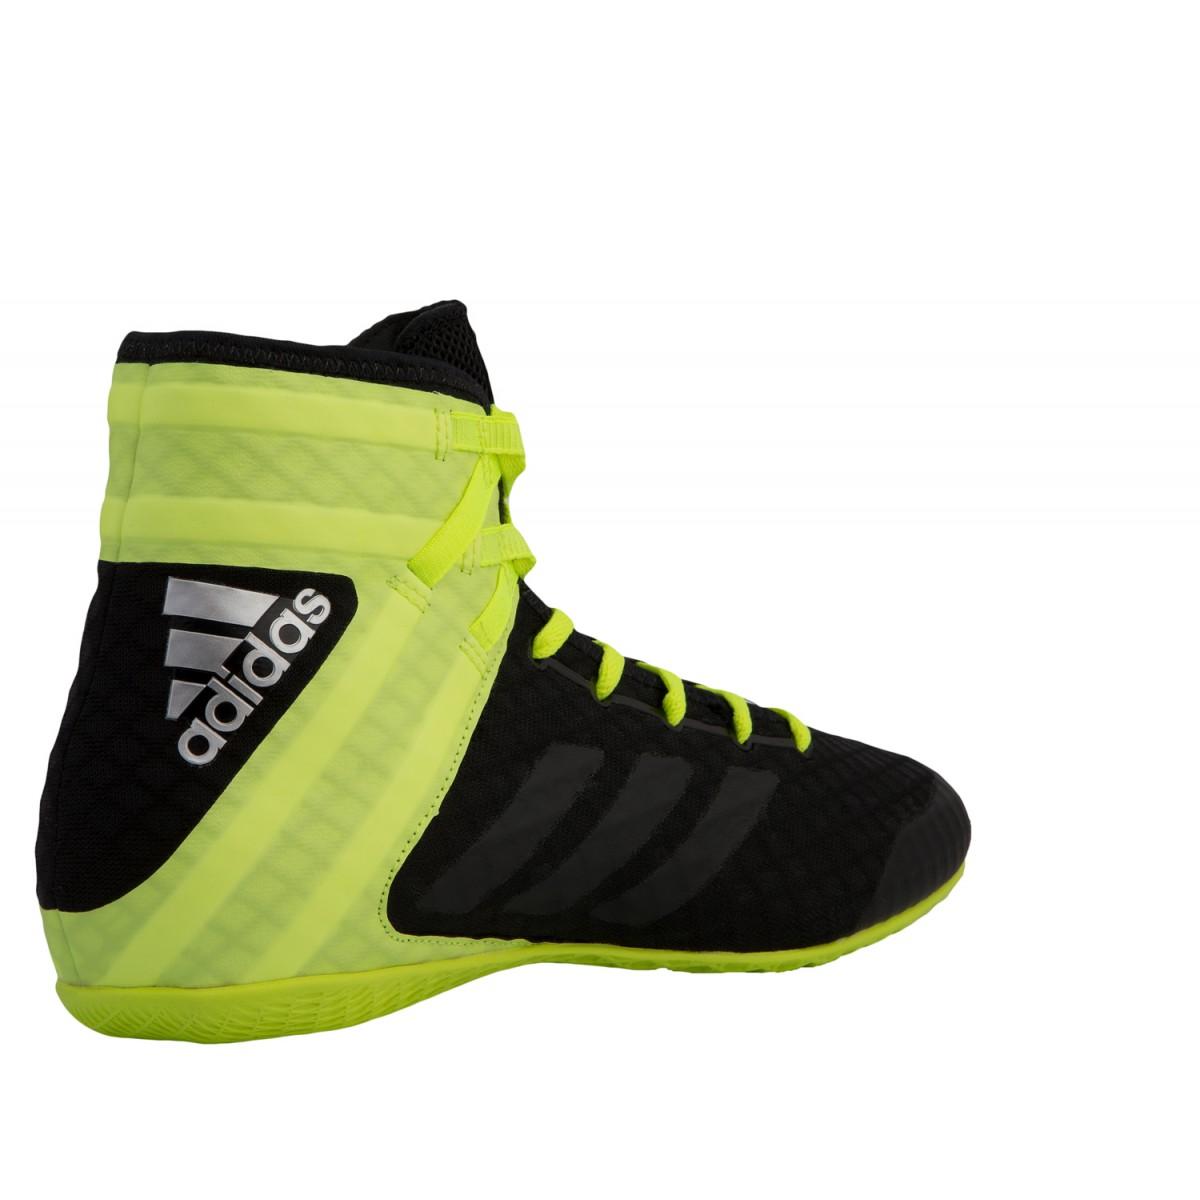 Women S Adidas Speedex 16 1 Boxing Shoes Black Yellow